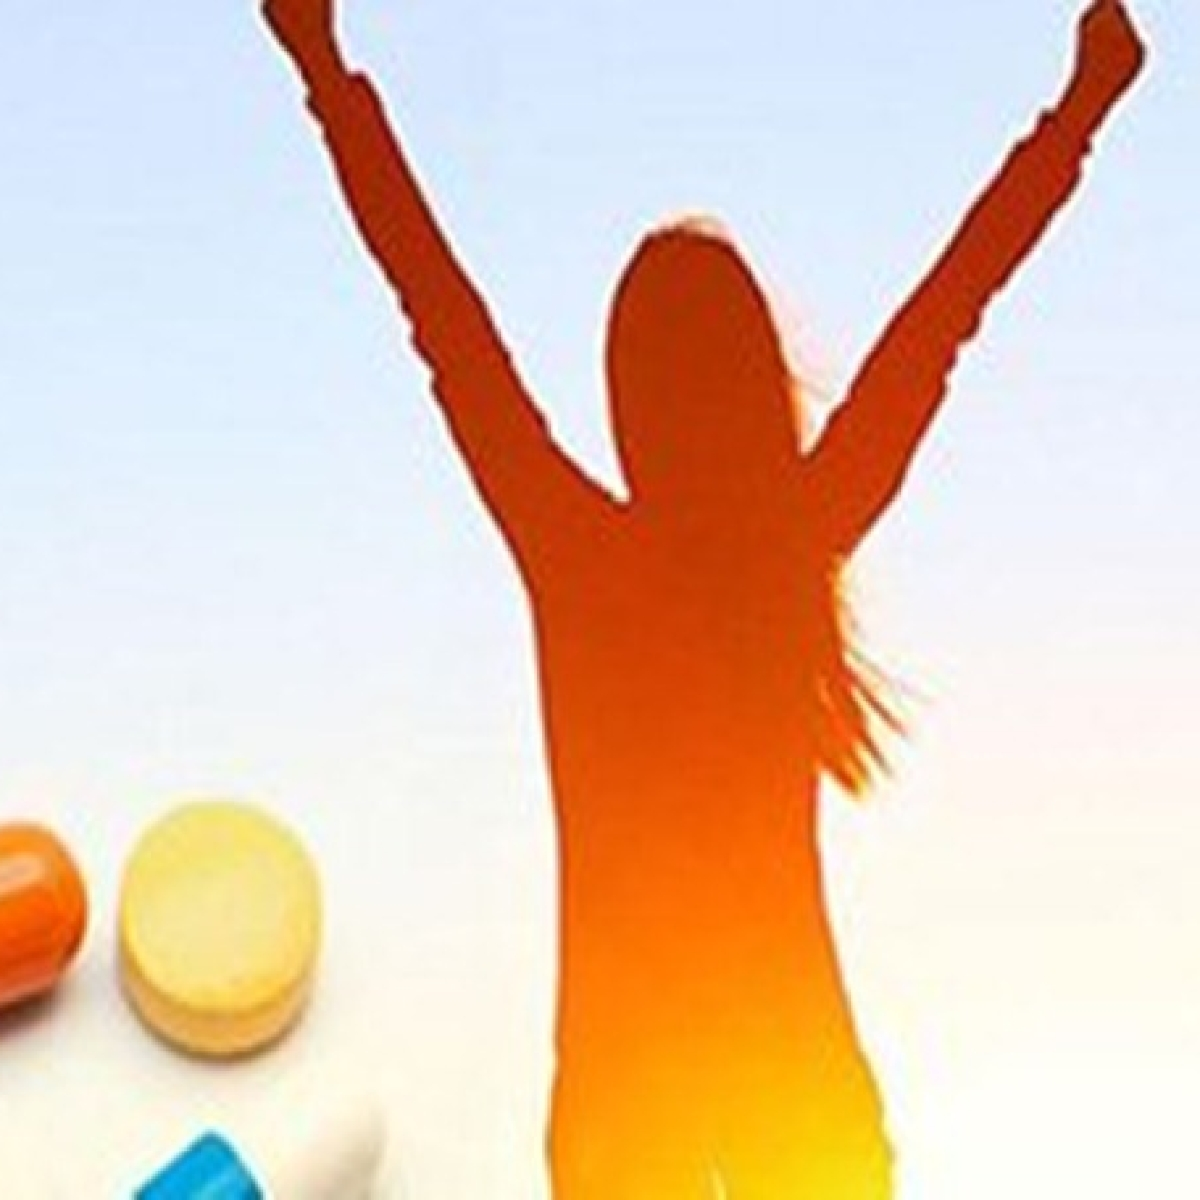 Budget 2020: Nirmala Sitharaman allocates Rs 69,000 cr on health, Rs 28,600 cr on woman development